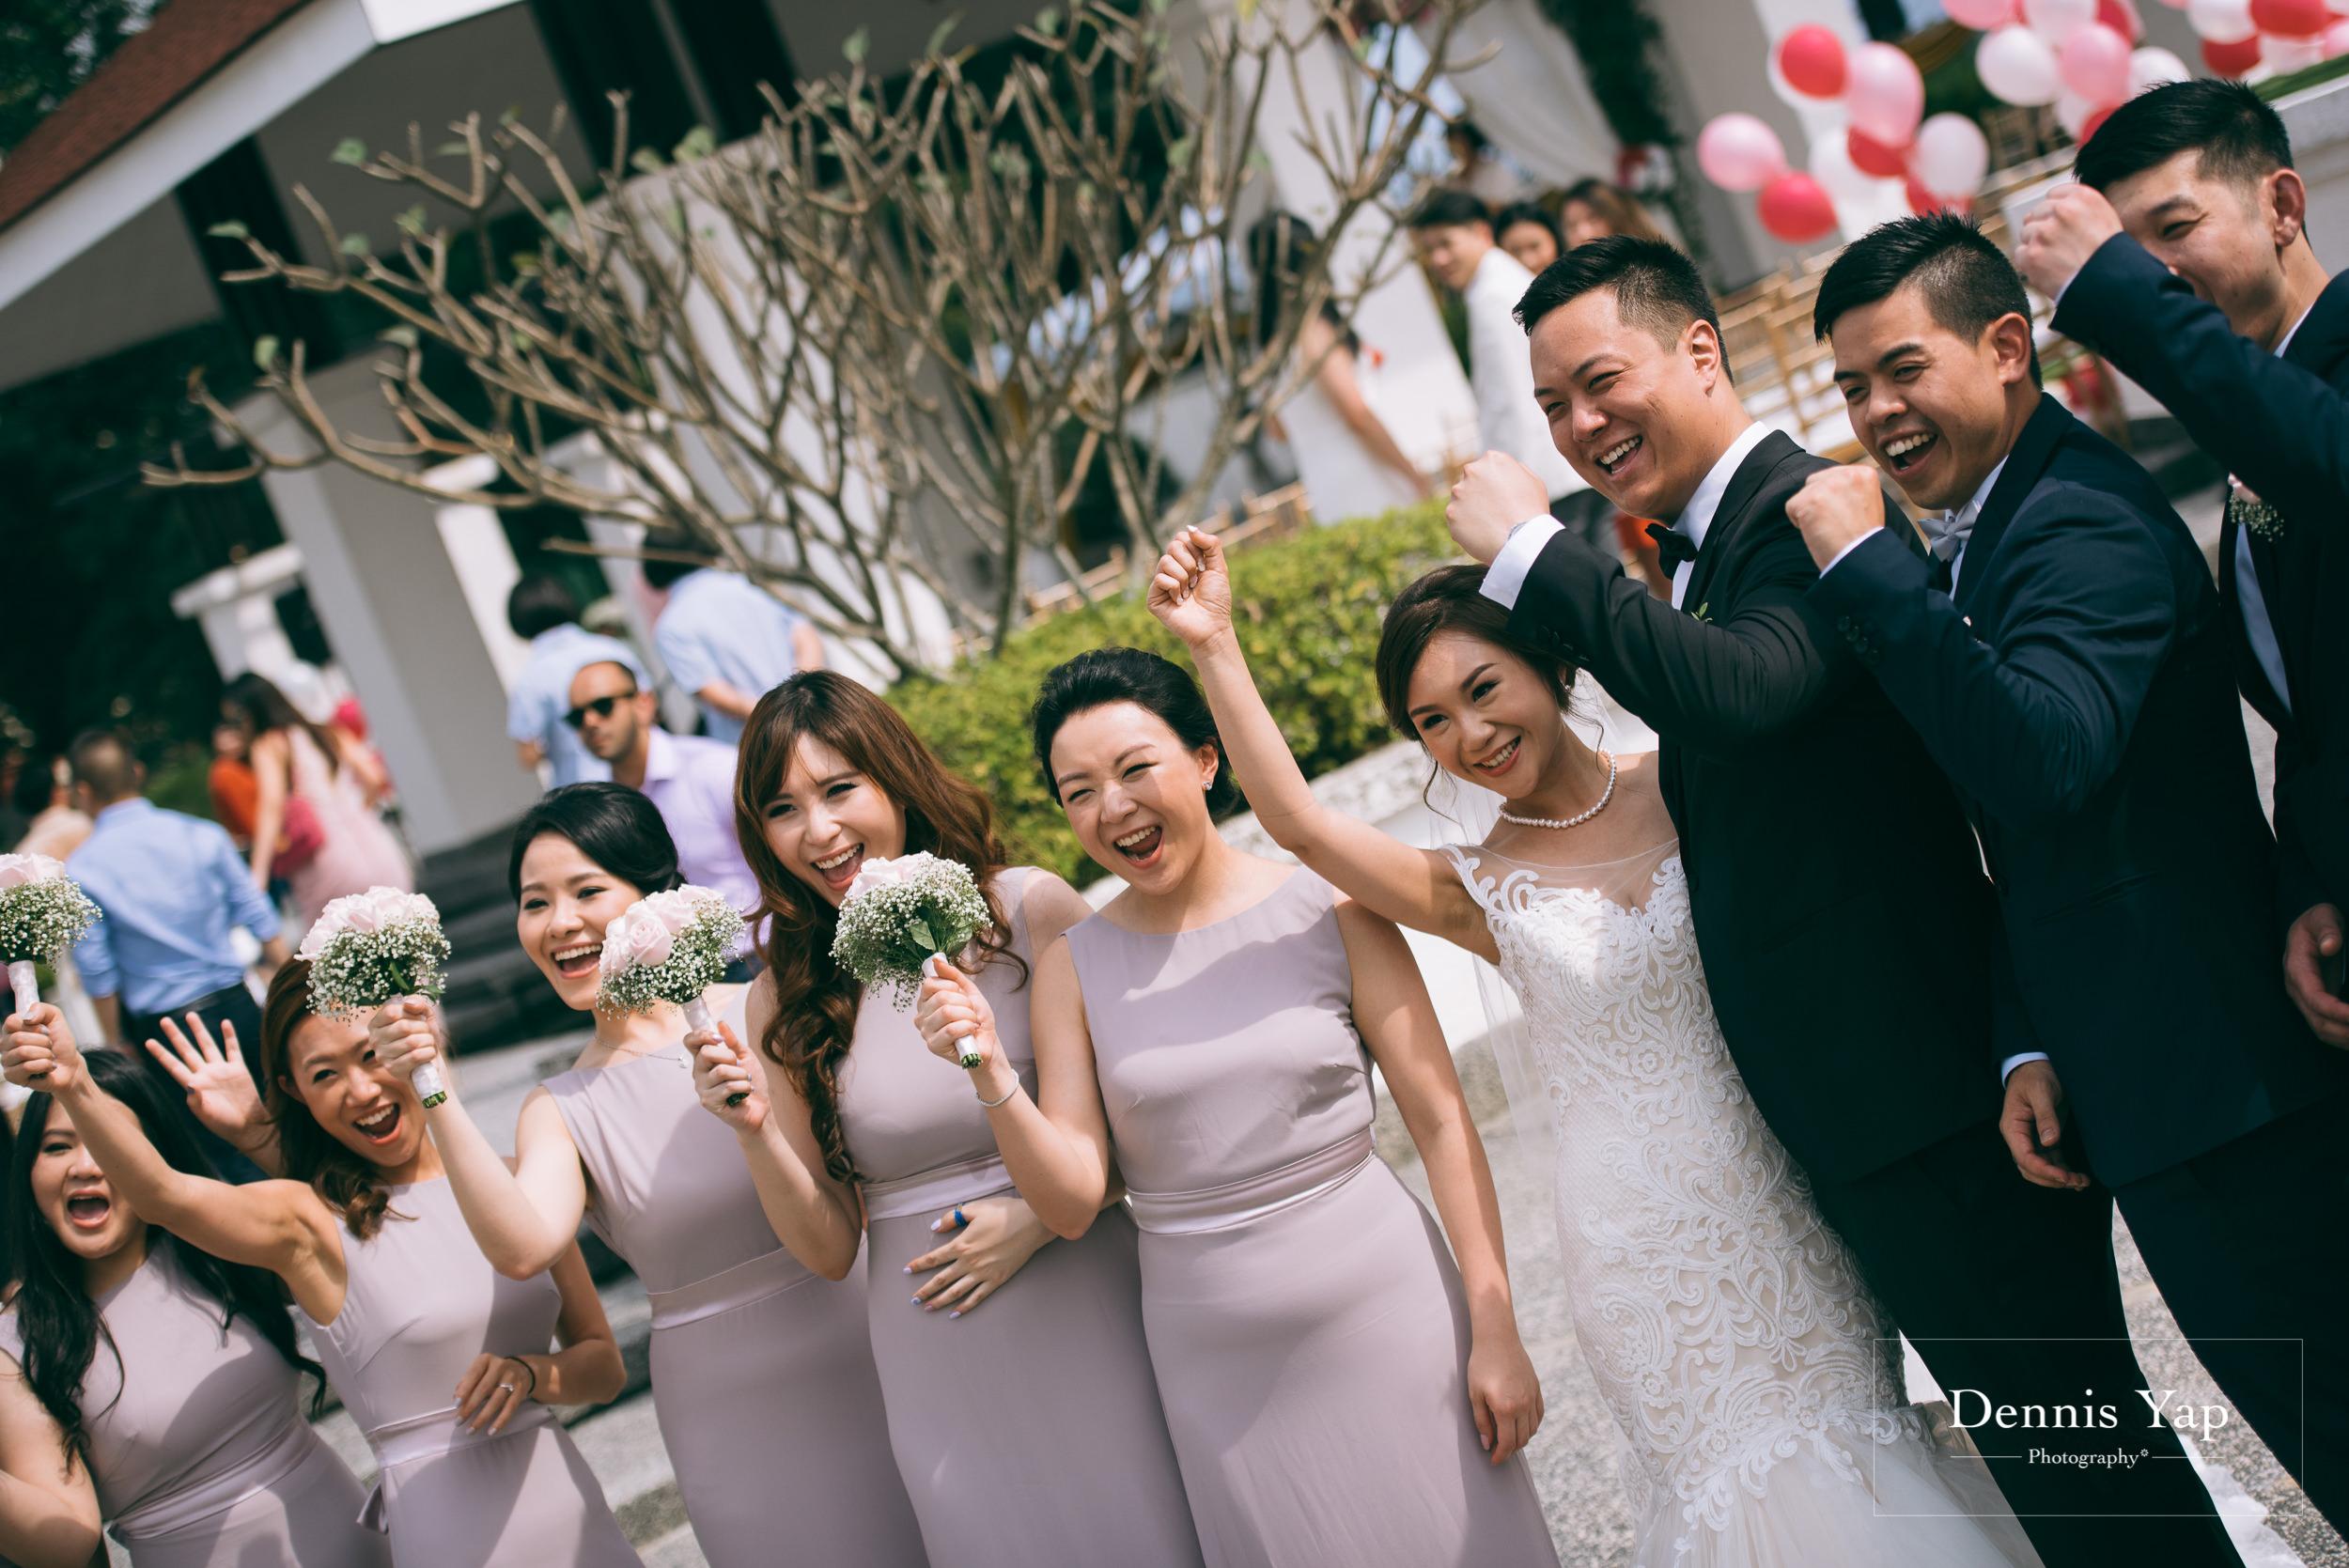 lionel joanne garden wedding majestic hotel dennis yap photography malaysia top wedding photographer-56.jpg